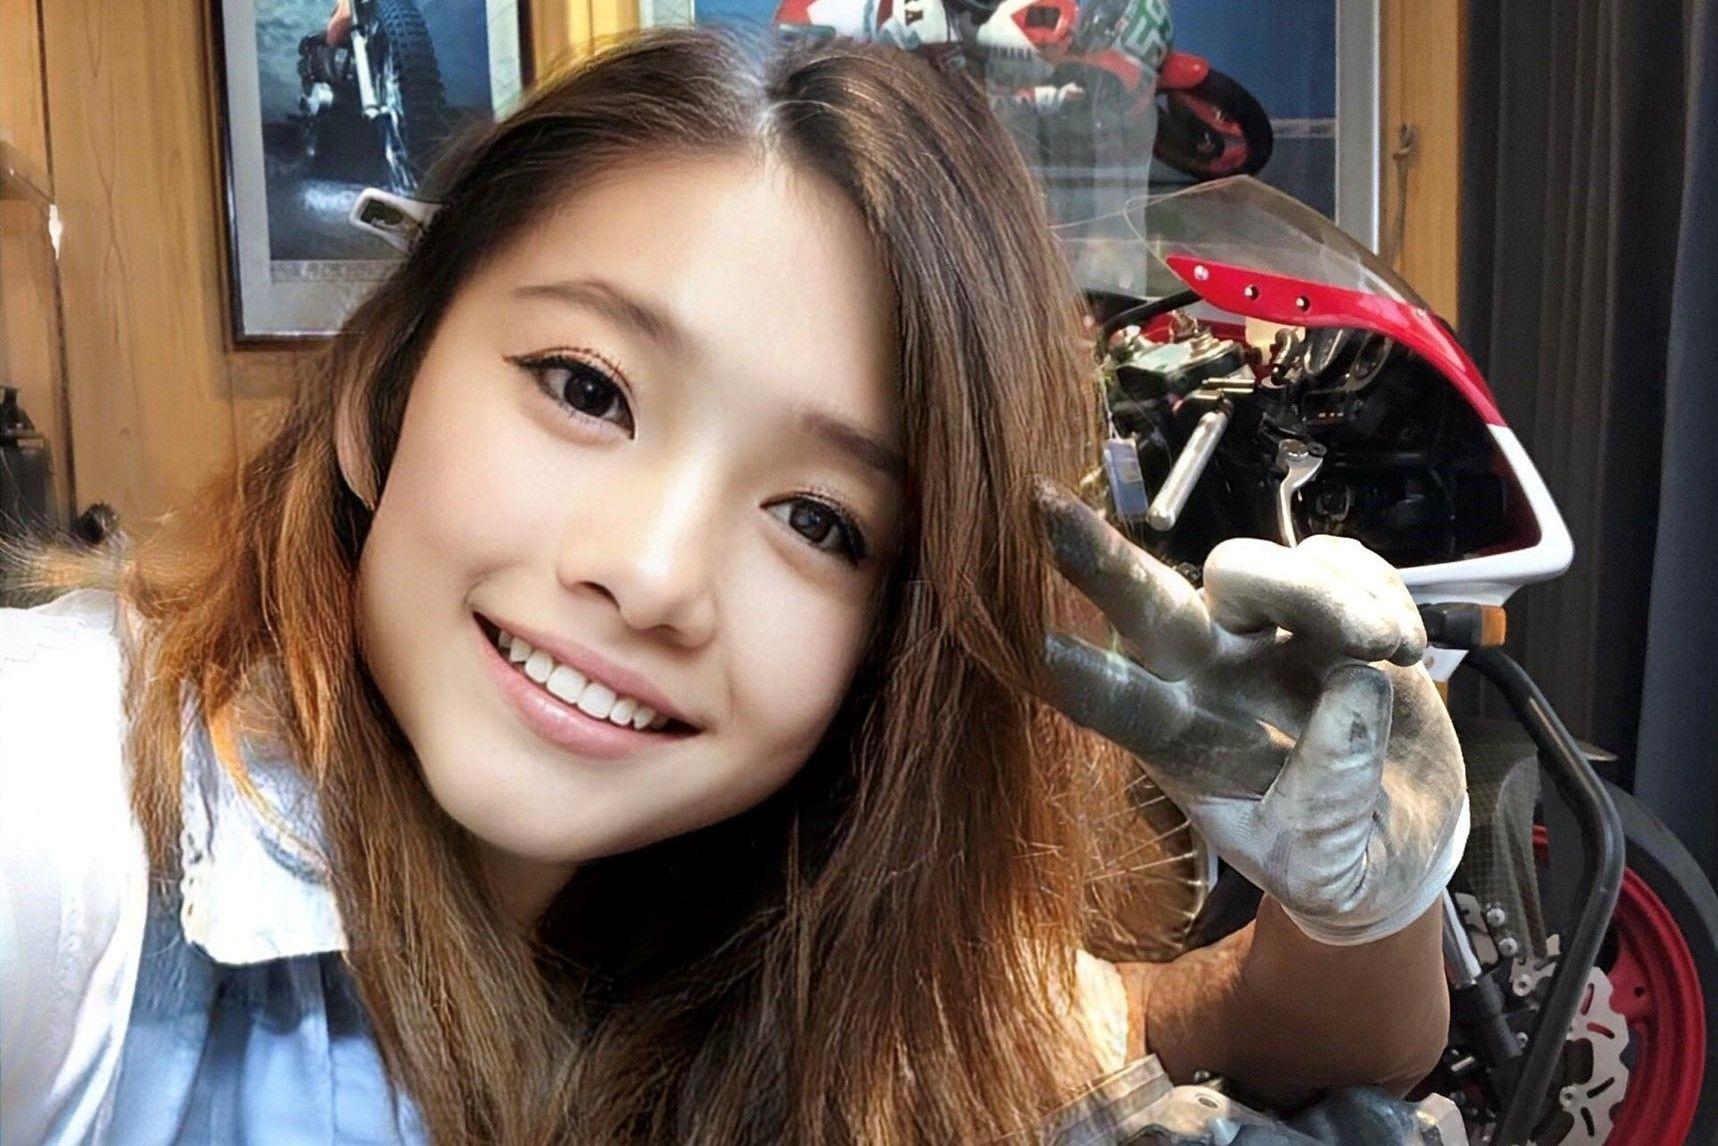 selfie γλυκιάς ιαπωνέζας μπροστά από την μηχανή της